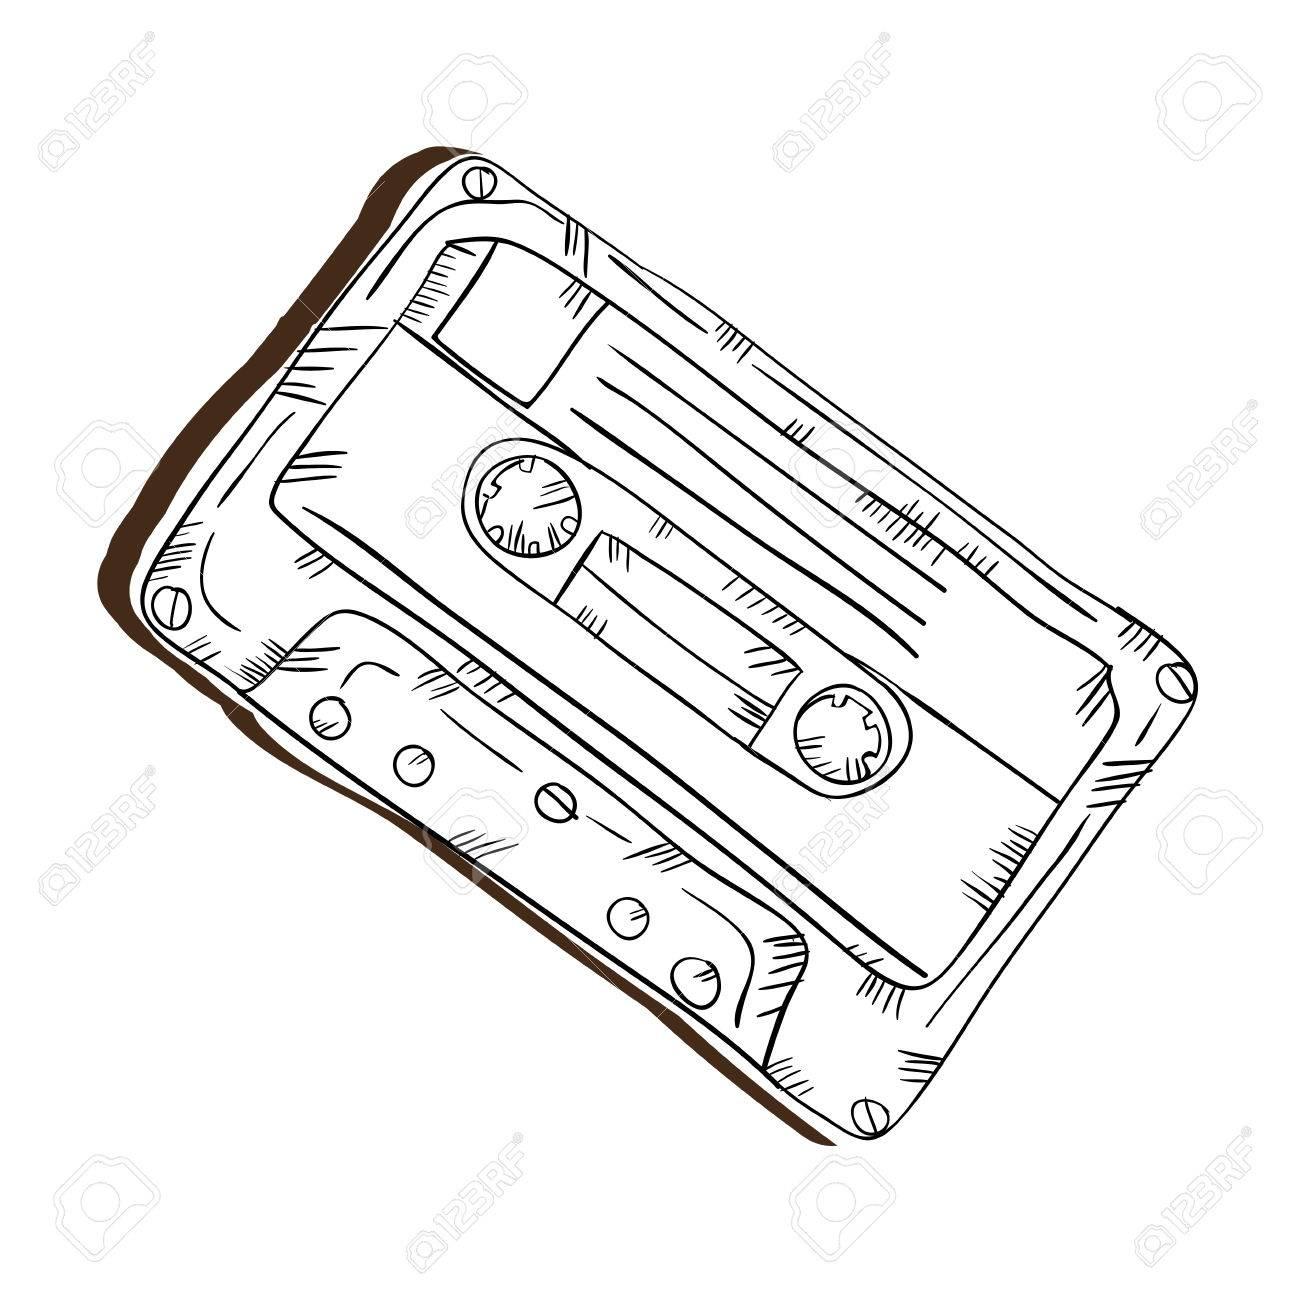 1300x1300 Retro Cassette Vintage Stereo Tape. Draw Design. Vector